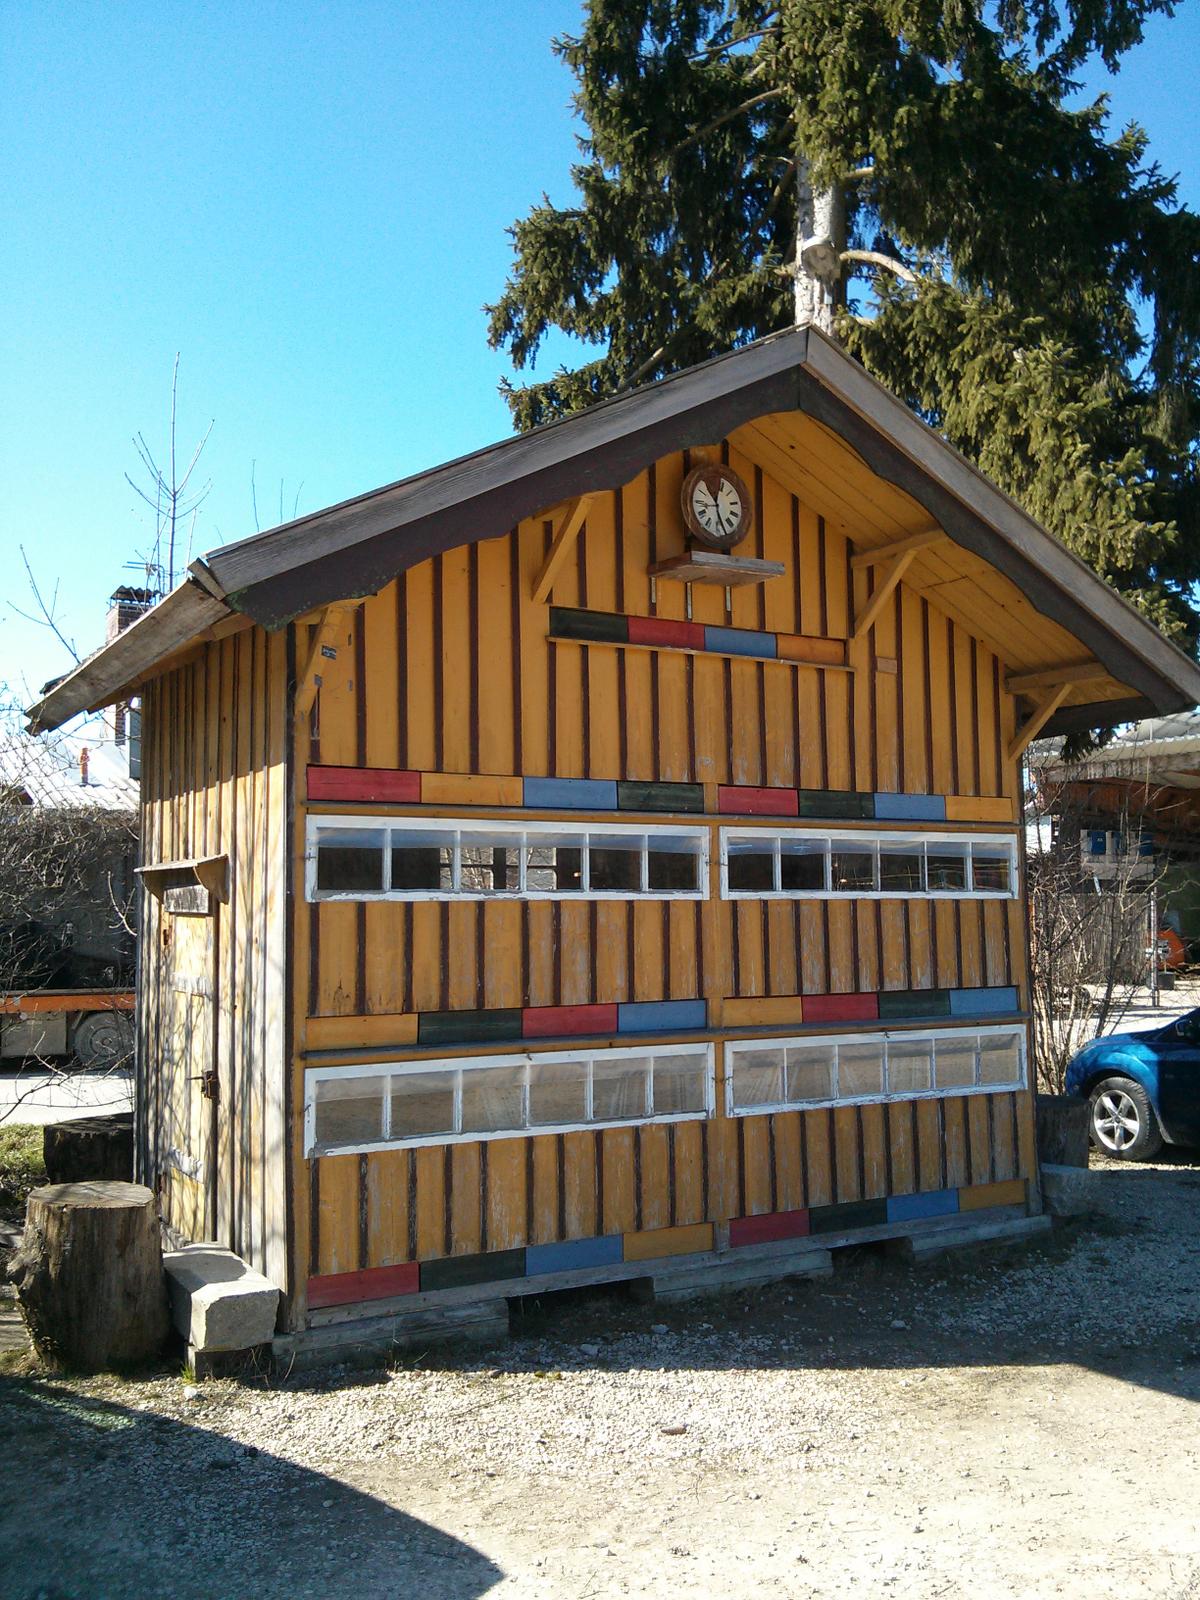 Bienenhaus Illertissen April 2013.png